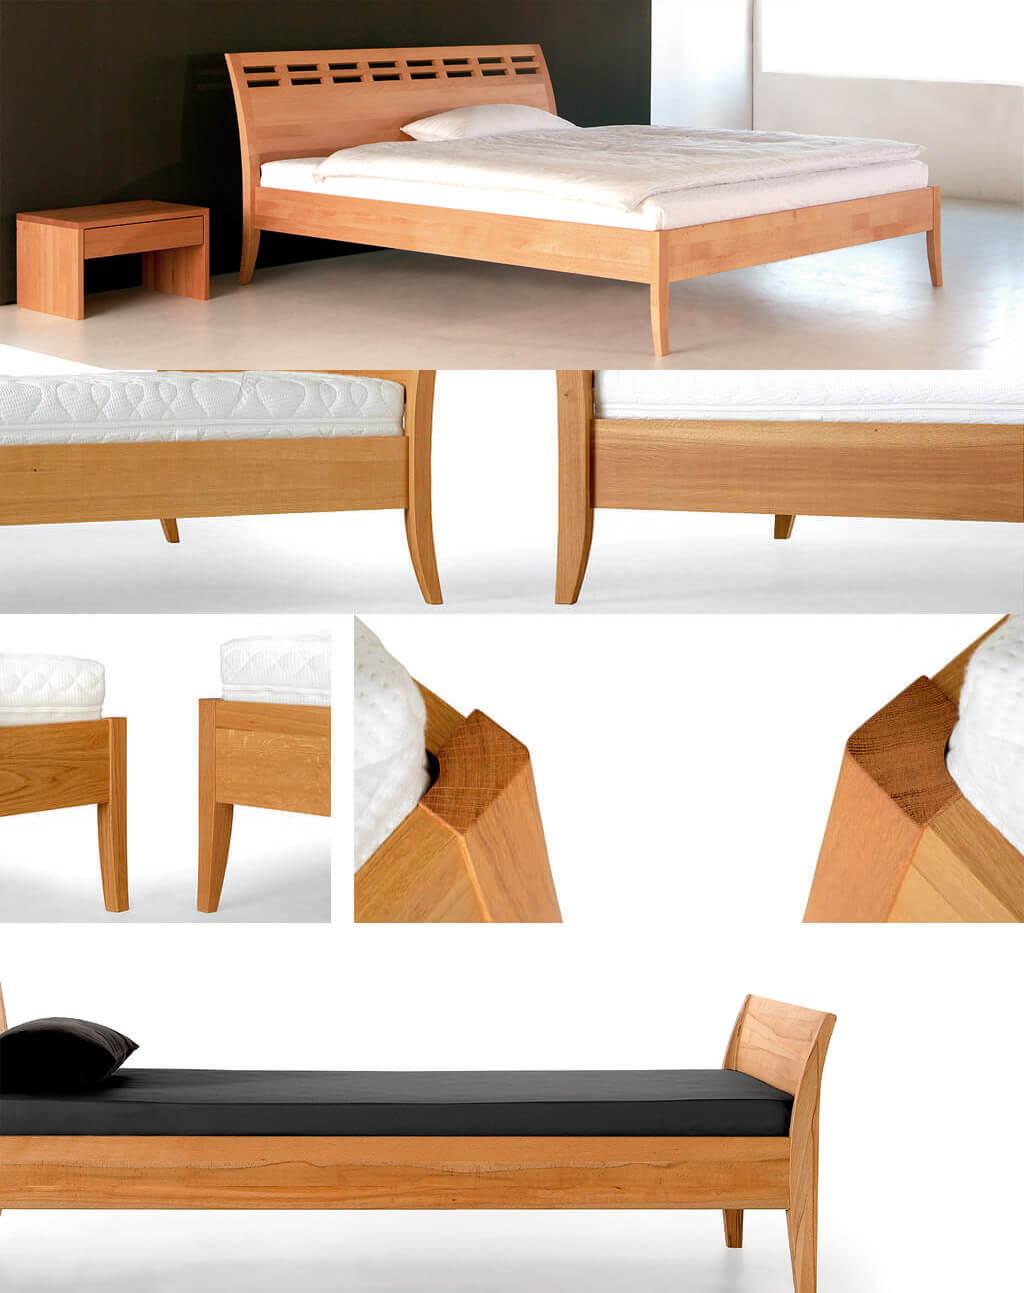 Coburger-Werksta-tten-Massivholzbett-Pro-Nicava-Produktmerkmale